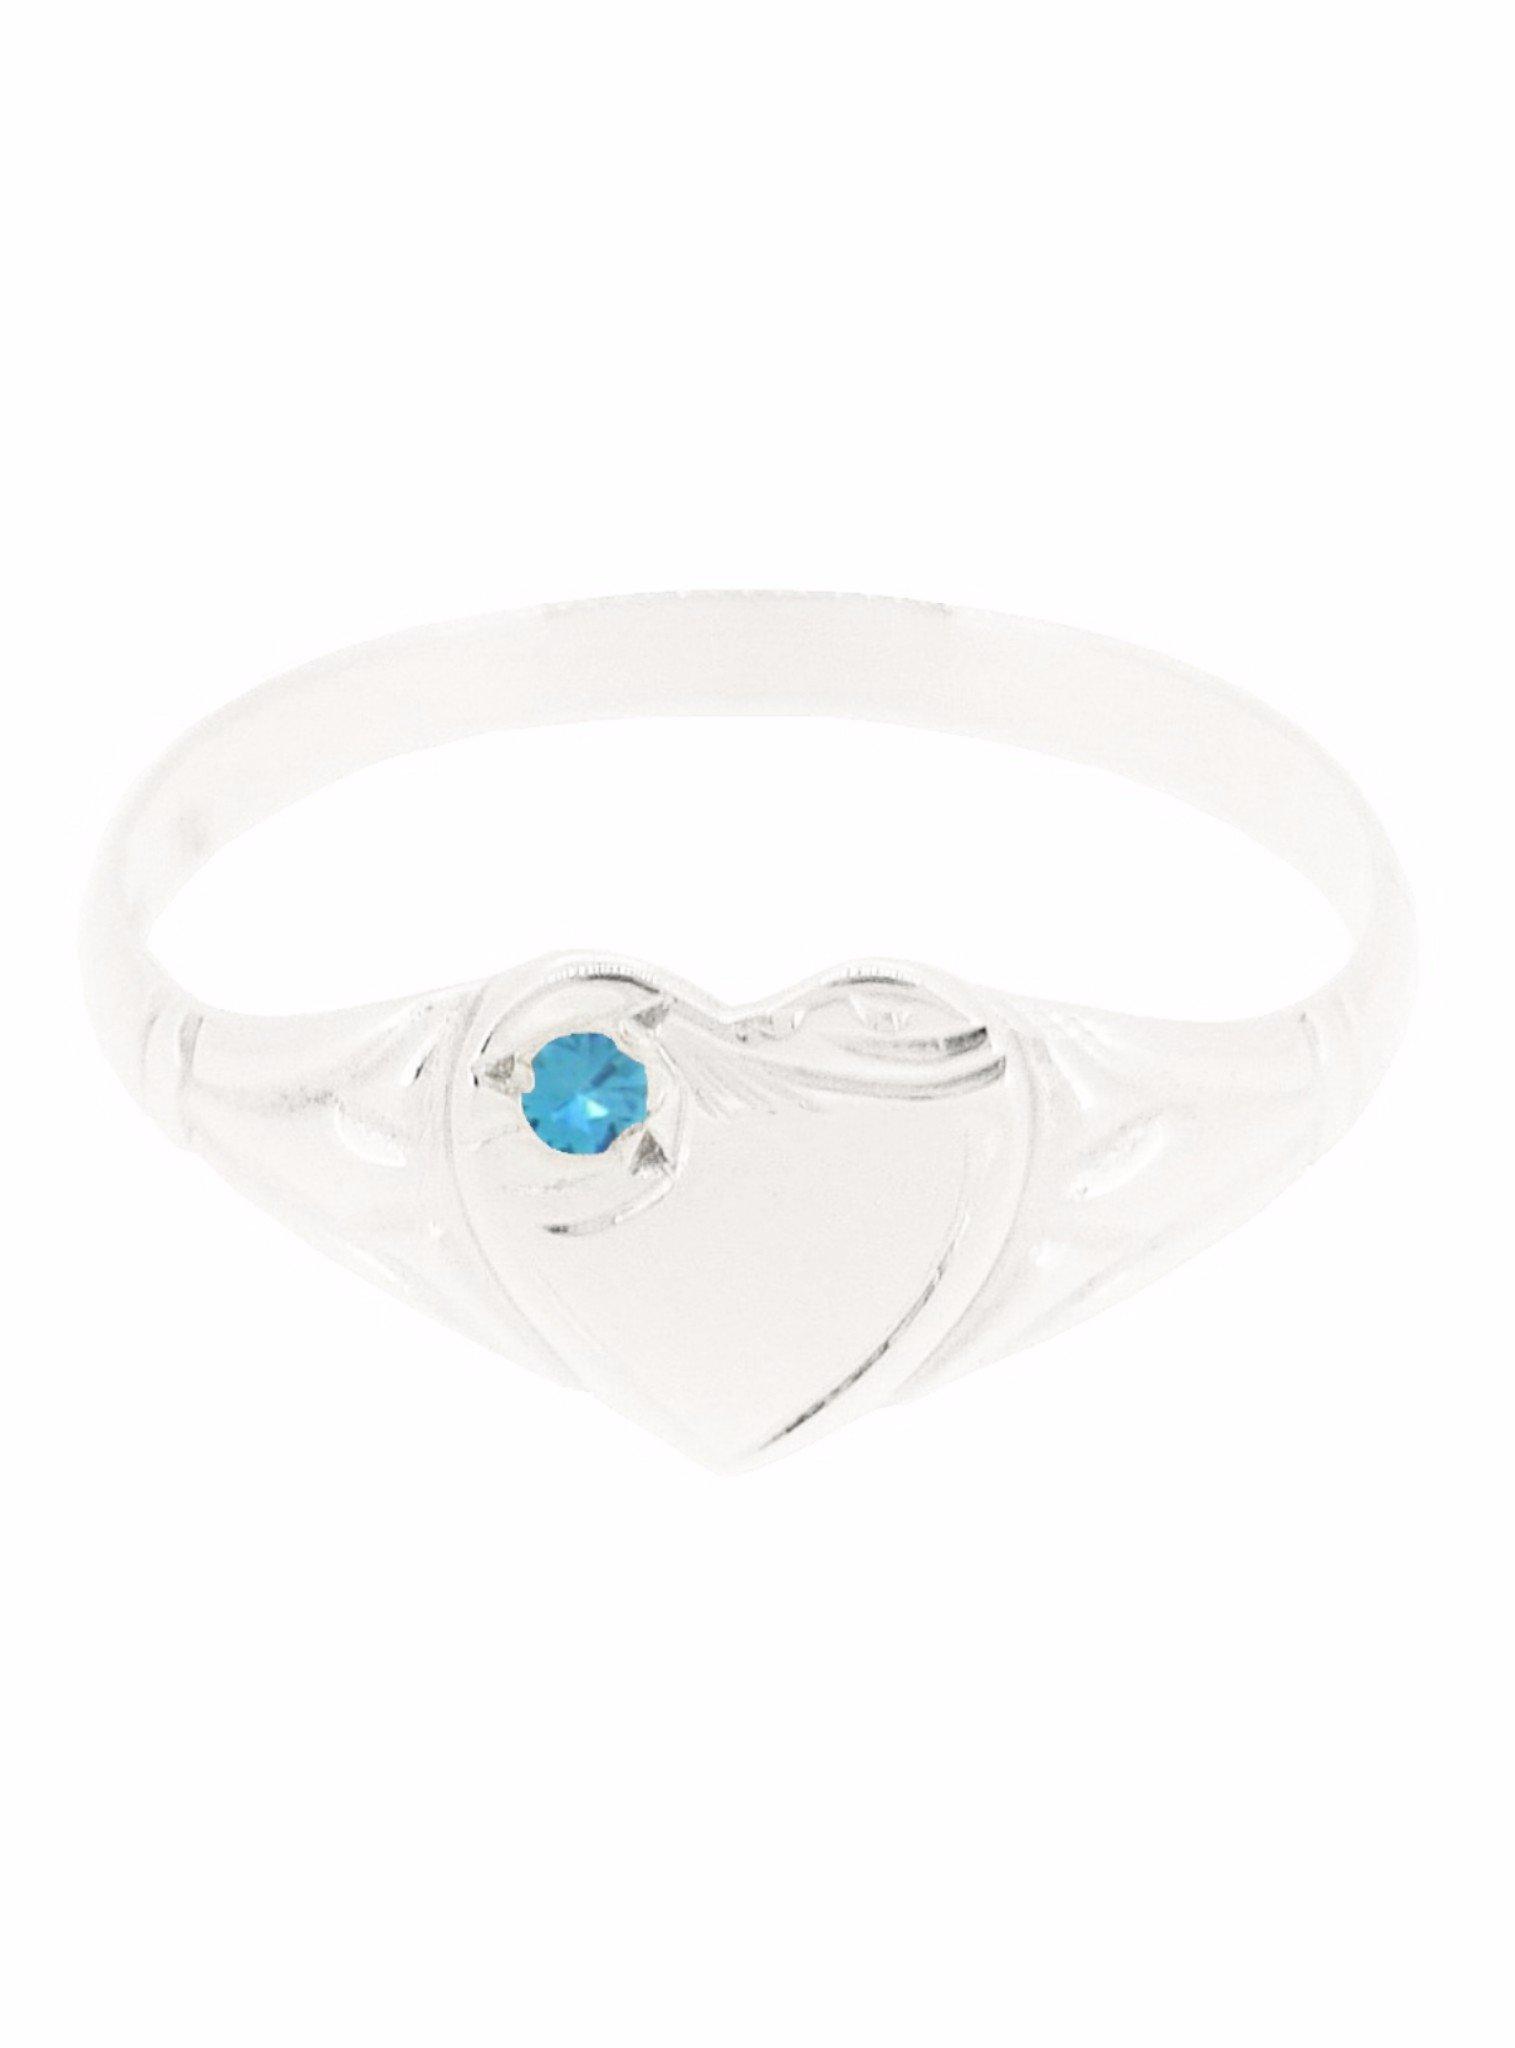 Sterling Silver Birthstone Heart Signet Ring